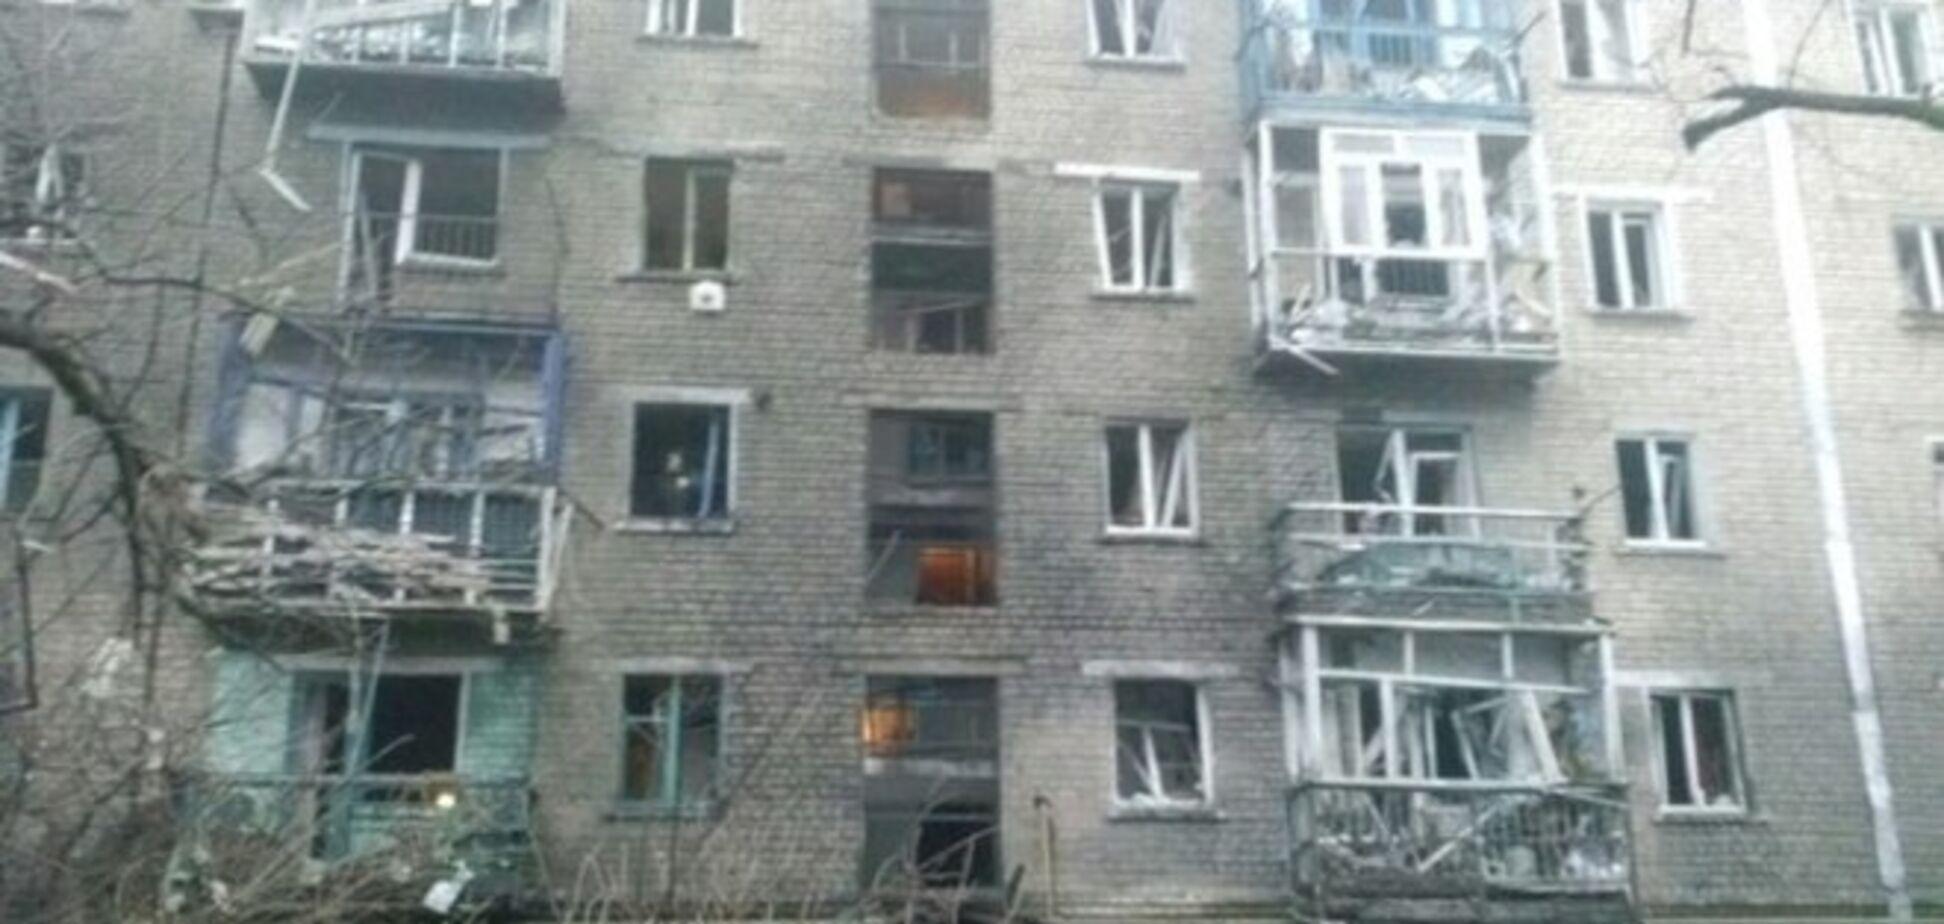 За день до обстрела Стаханова боевики предупредили горожан и объявили о бомбоубежищах